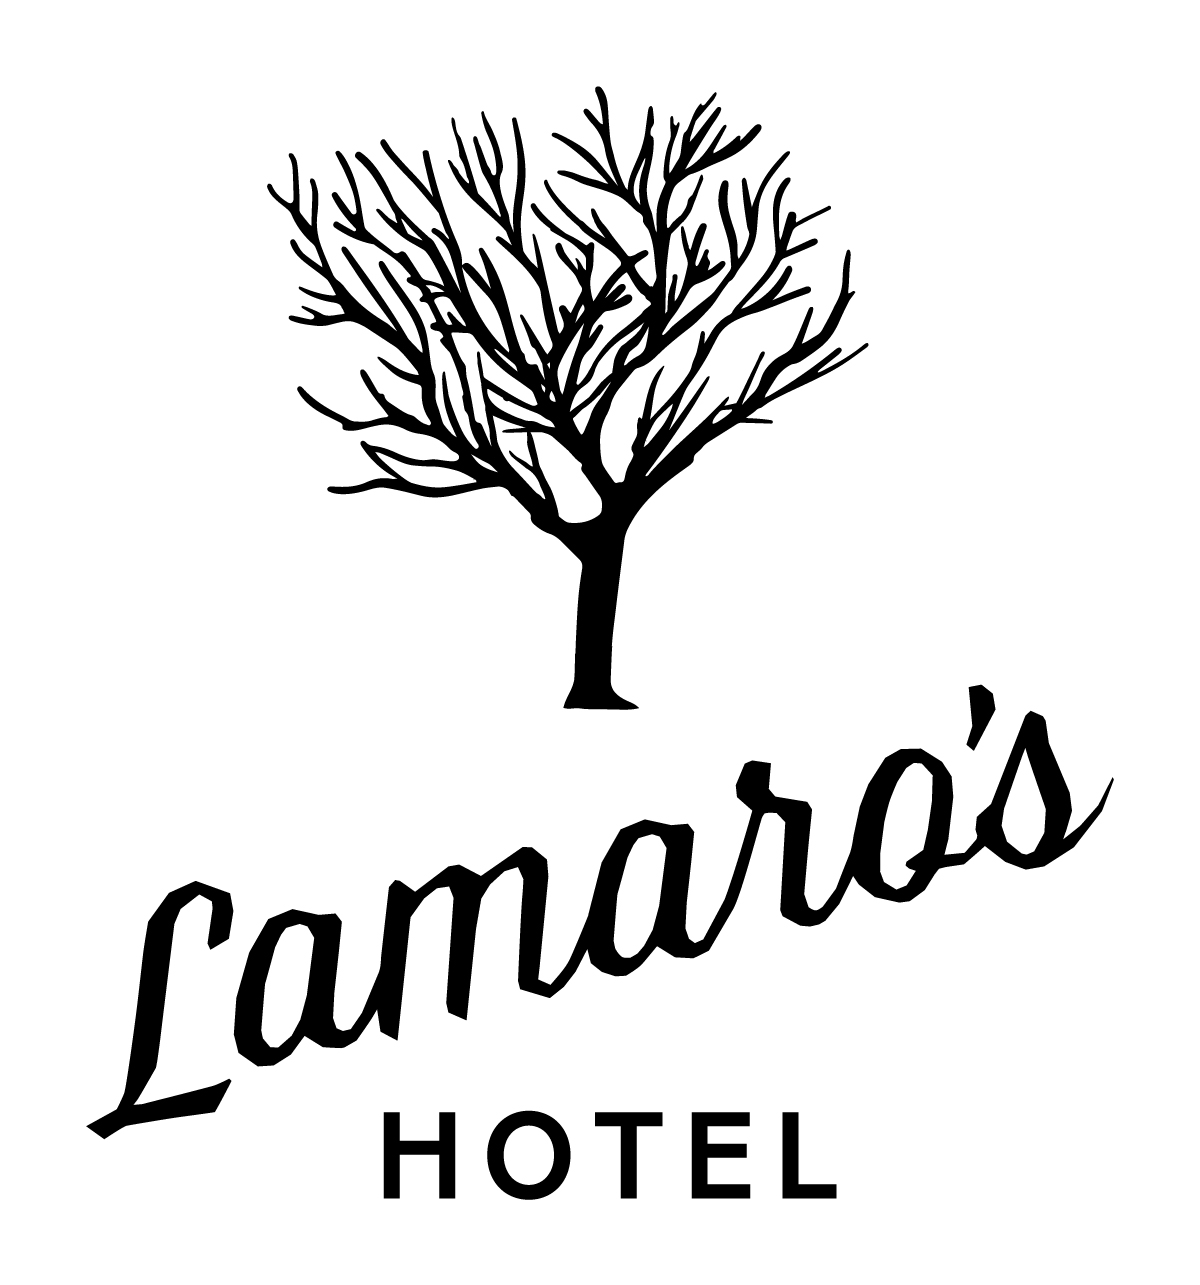 Lamaros Hotel Logo.jpg